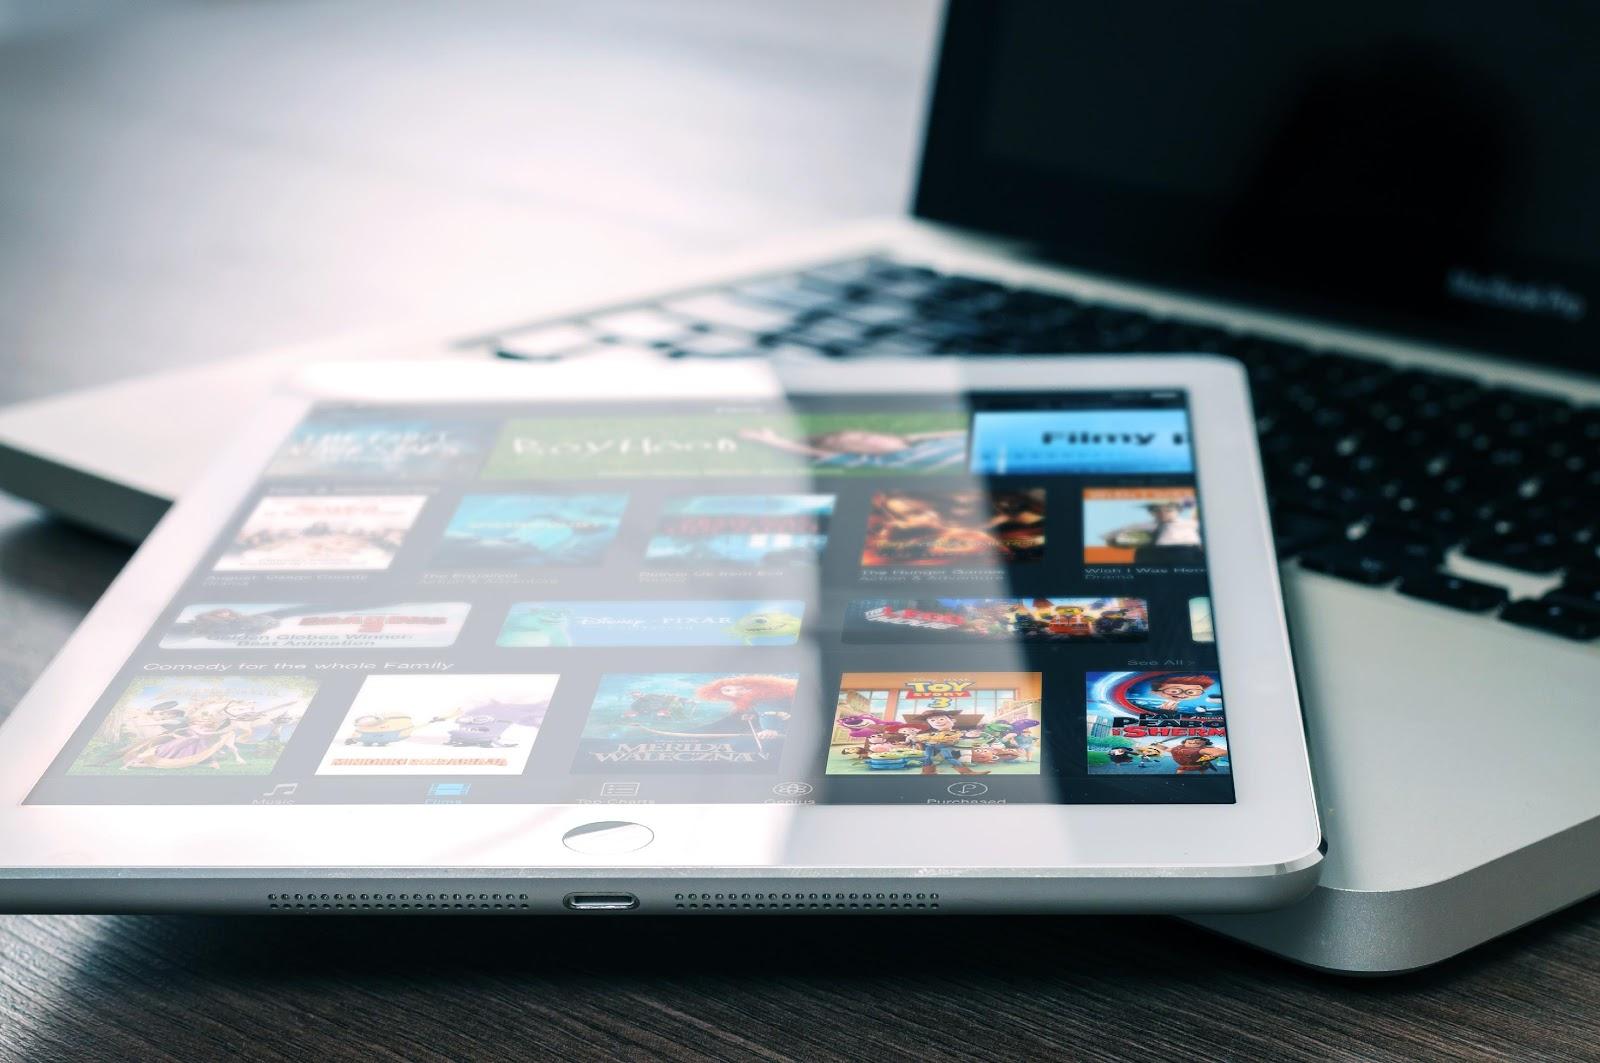 Ver series o películas en Internet